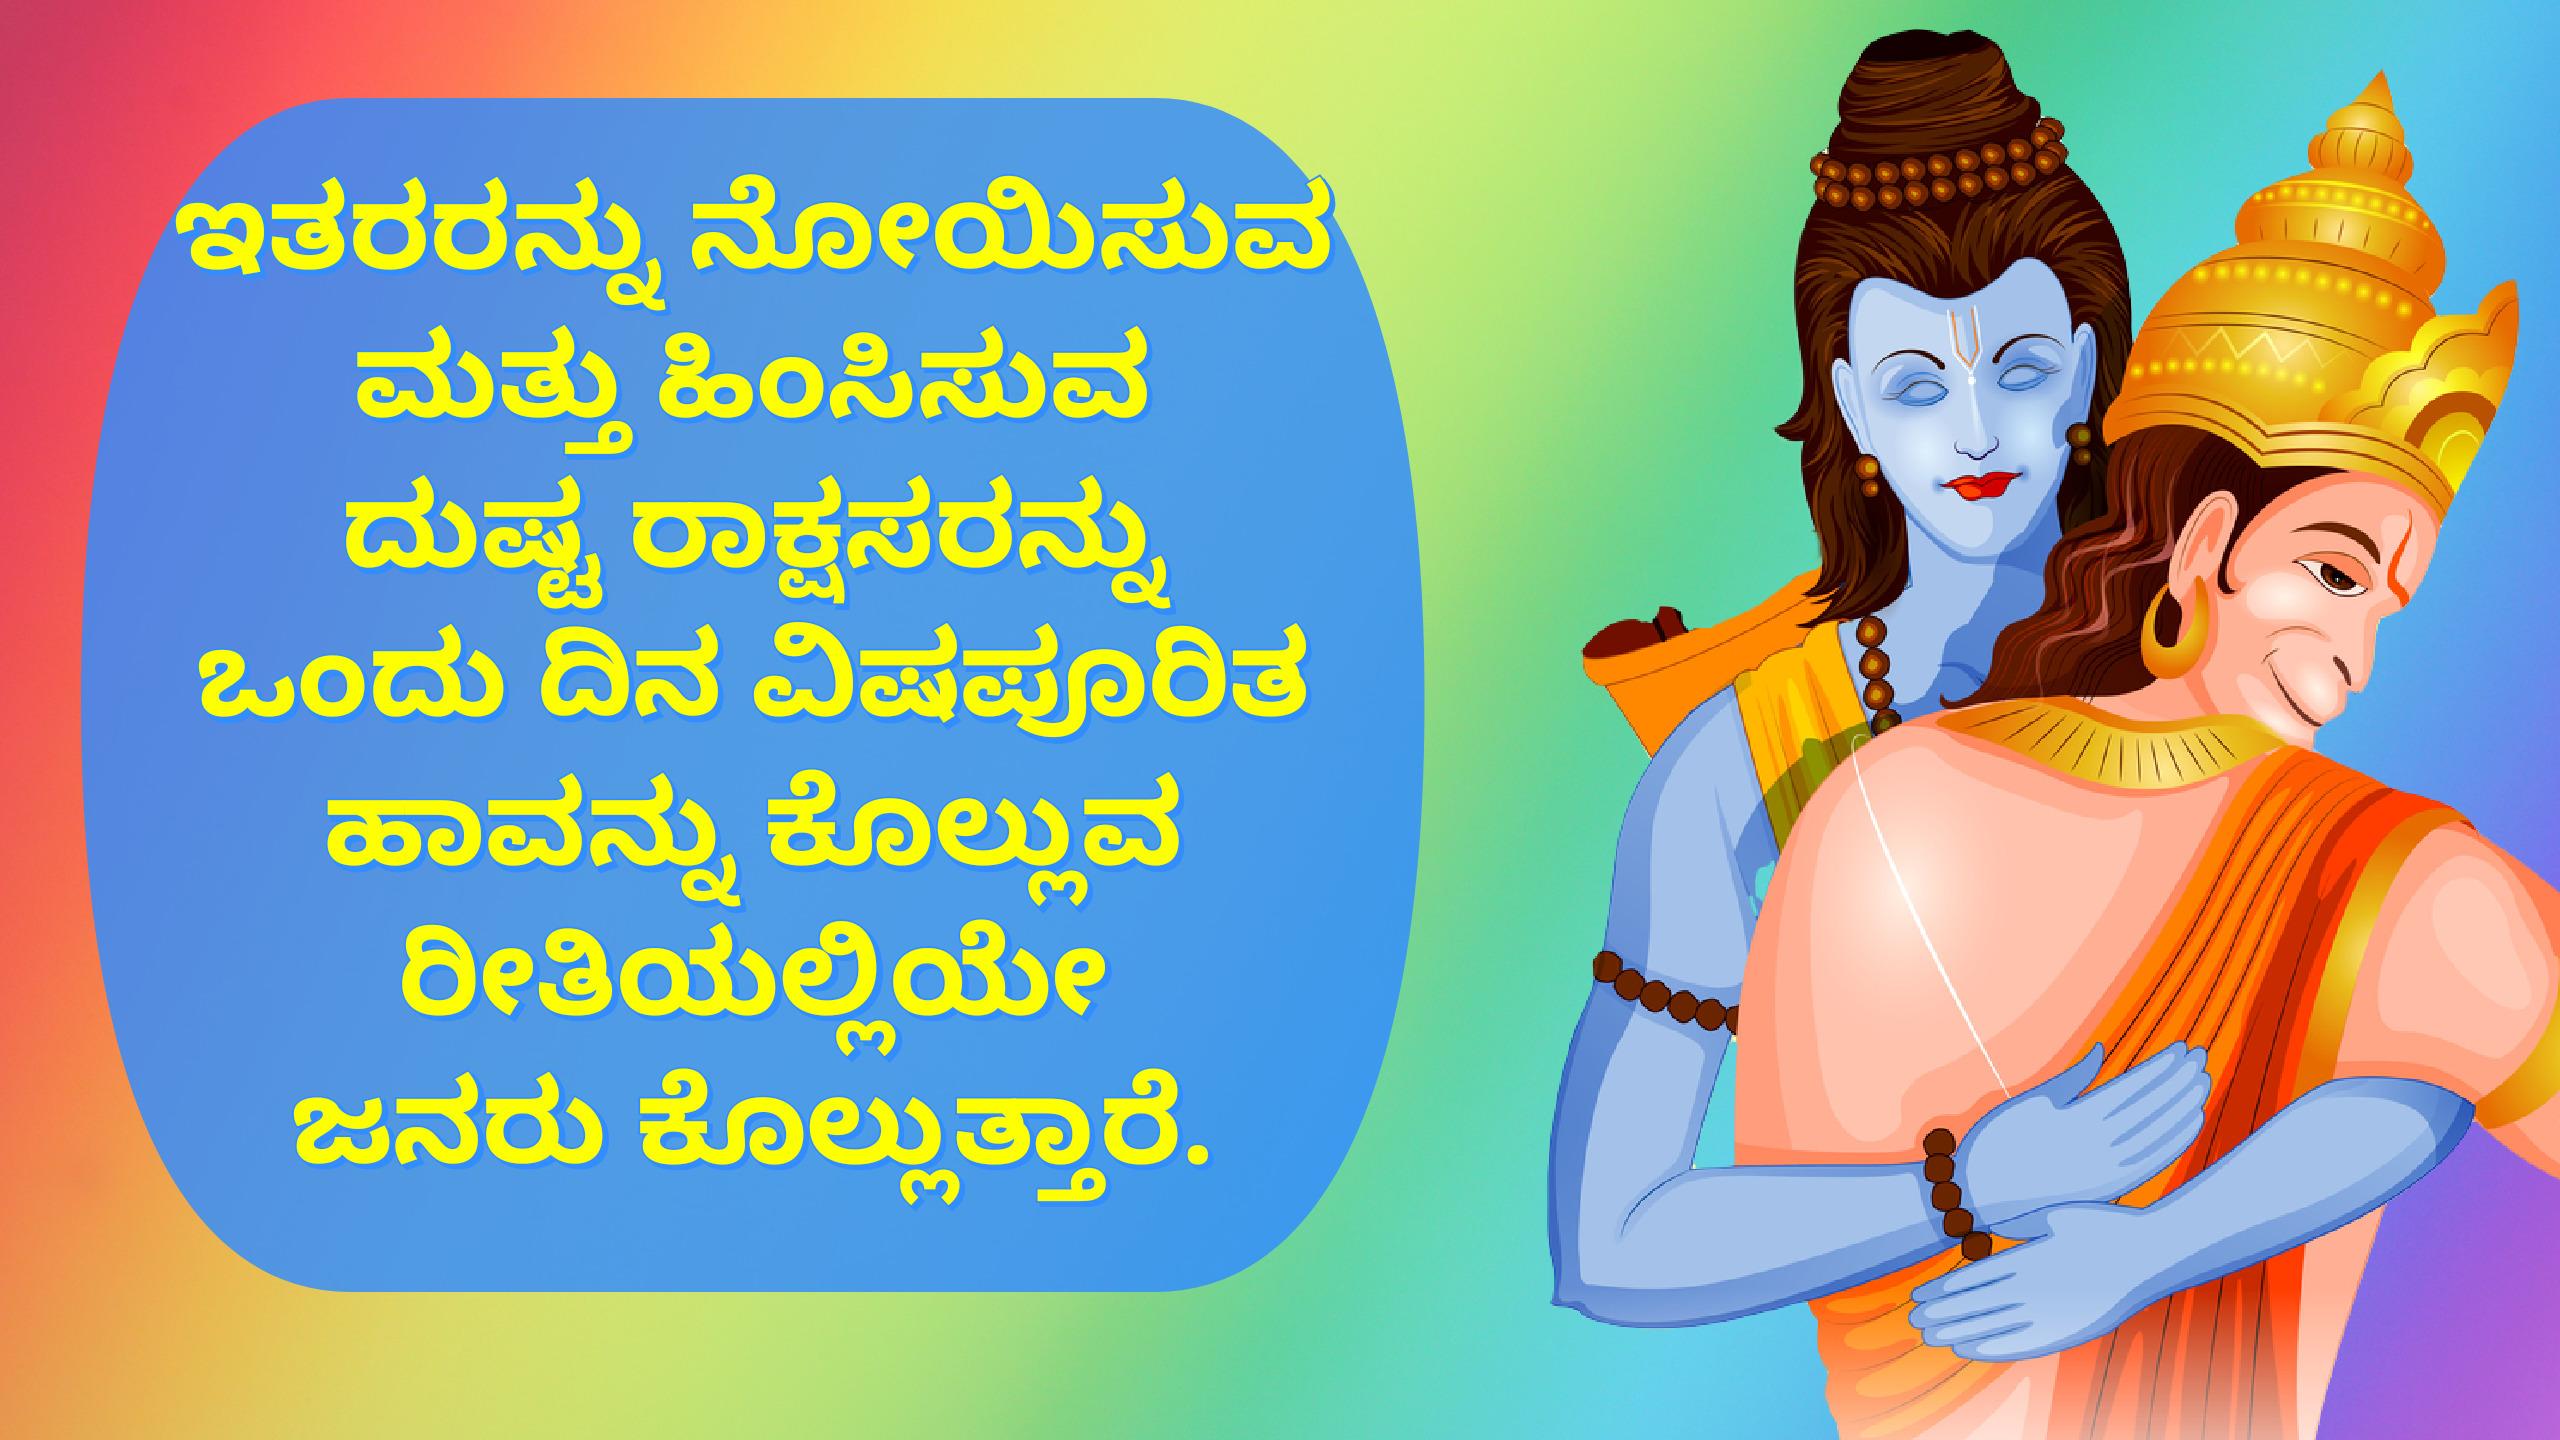 11. Shree Ram Quotes in Kannada